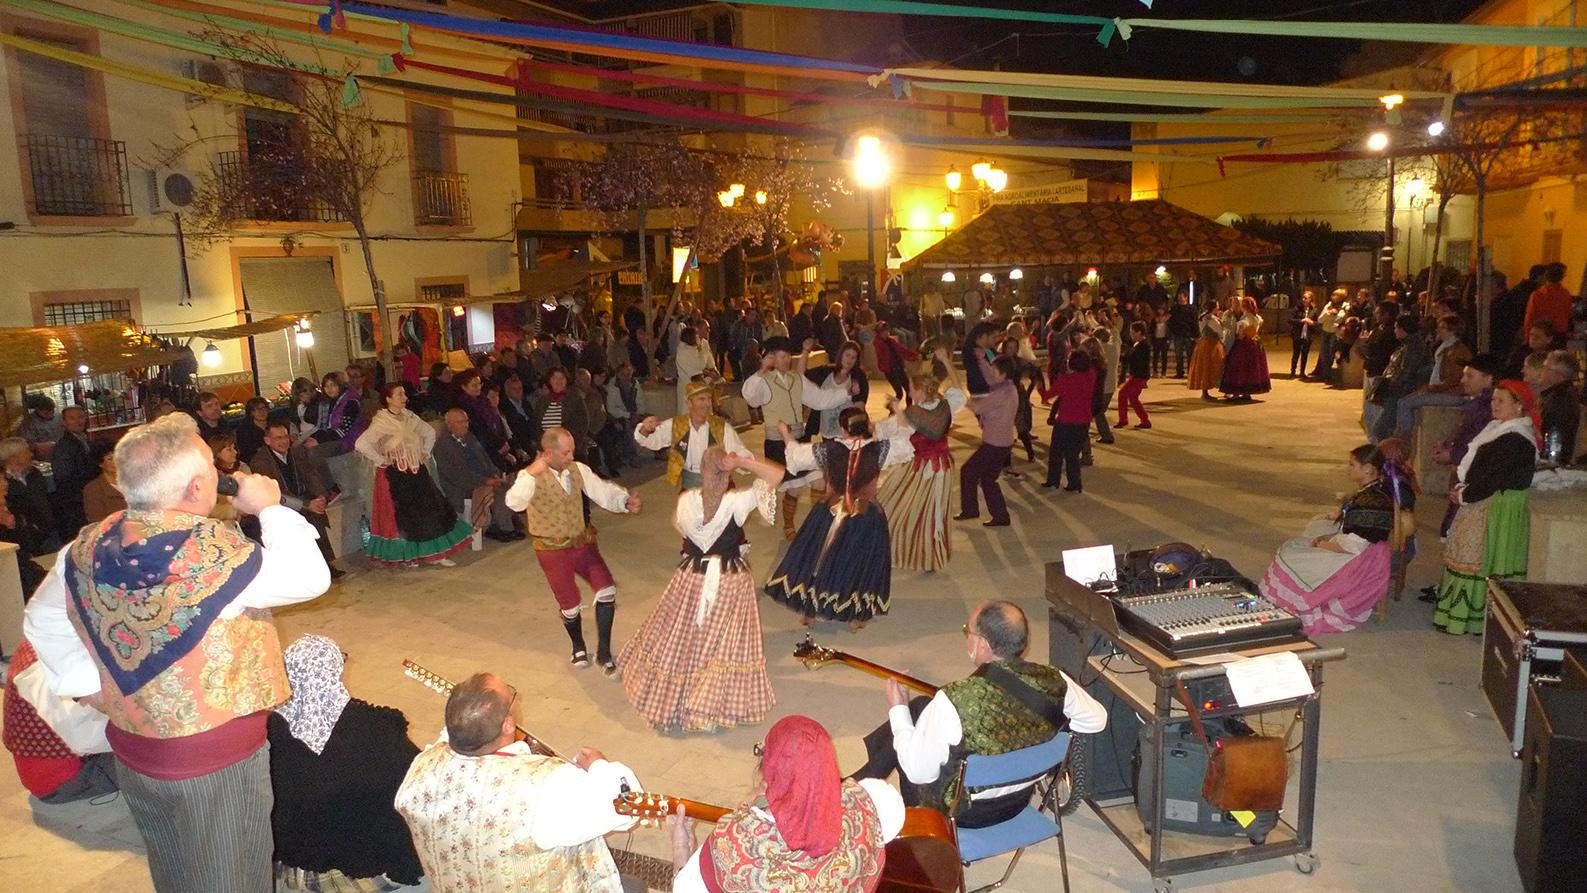 2014-02-23 - Baladre a Fira St. Marcia-ROTOVA (229)